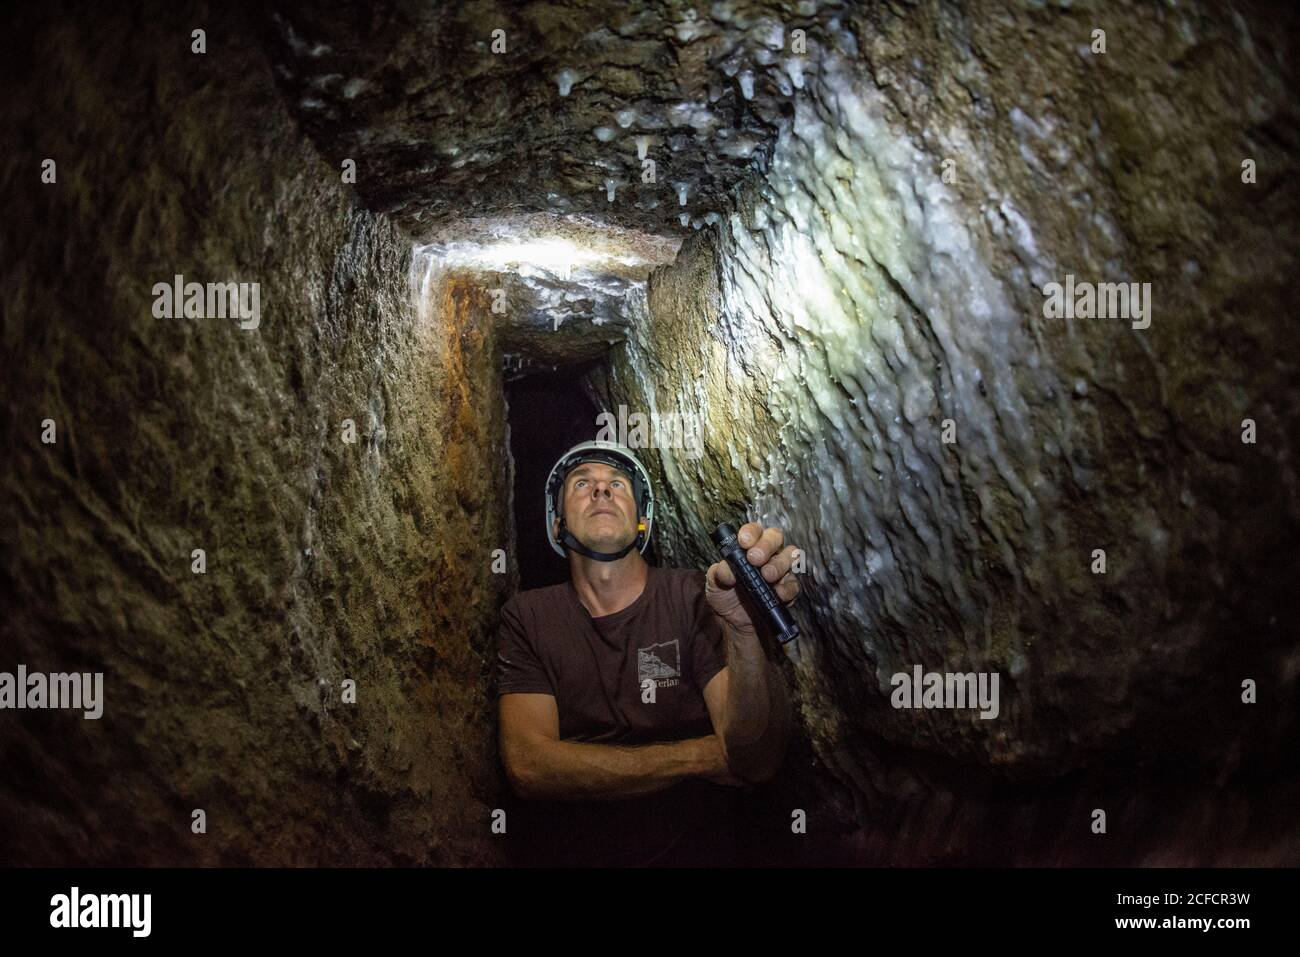 Italy, Trentino-South Tyrol, Alto Adige, Alto Adige, Etschtal, Terlan / Terlano, lead, silver, mining, Terlan silver mine, tunnels, gap in porphyry Stock Photo